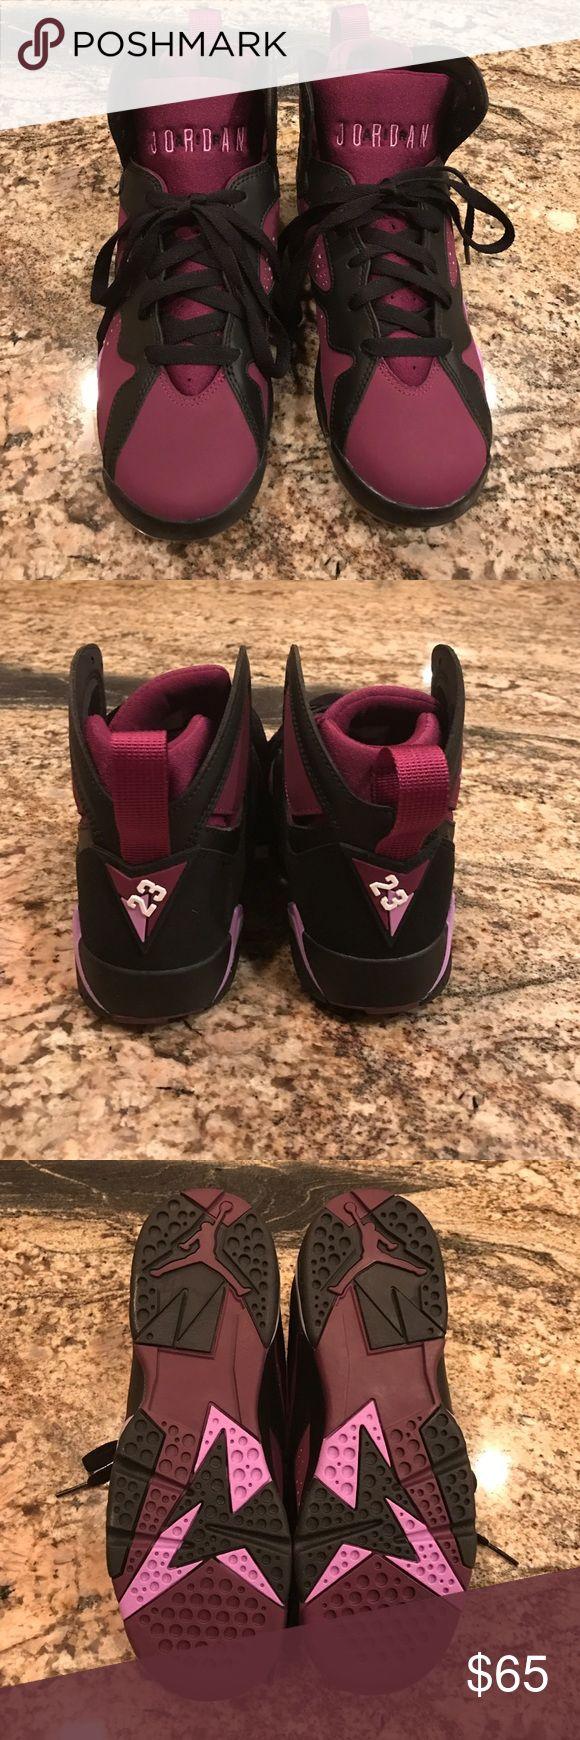 Air Jordan sneakers Air Jordan 7 Retro Girls Mulberry Color: Black/Fuchsia Glow-Mulberry-Wolf Grey. Never Worn Air Jordans Shoes Sneakers